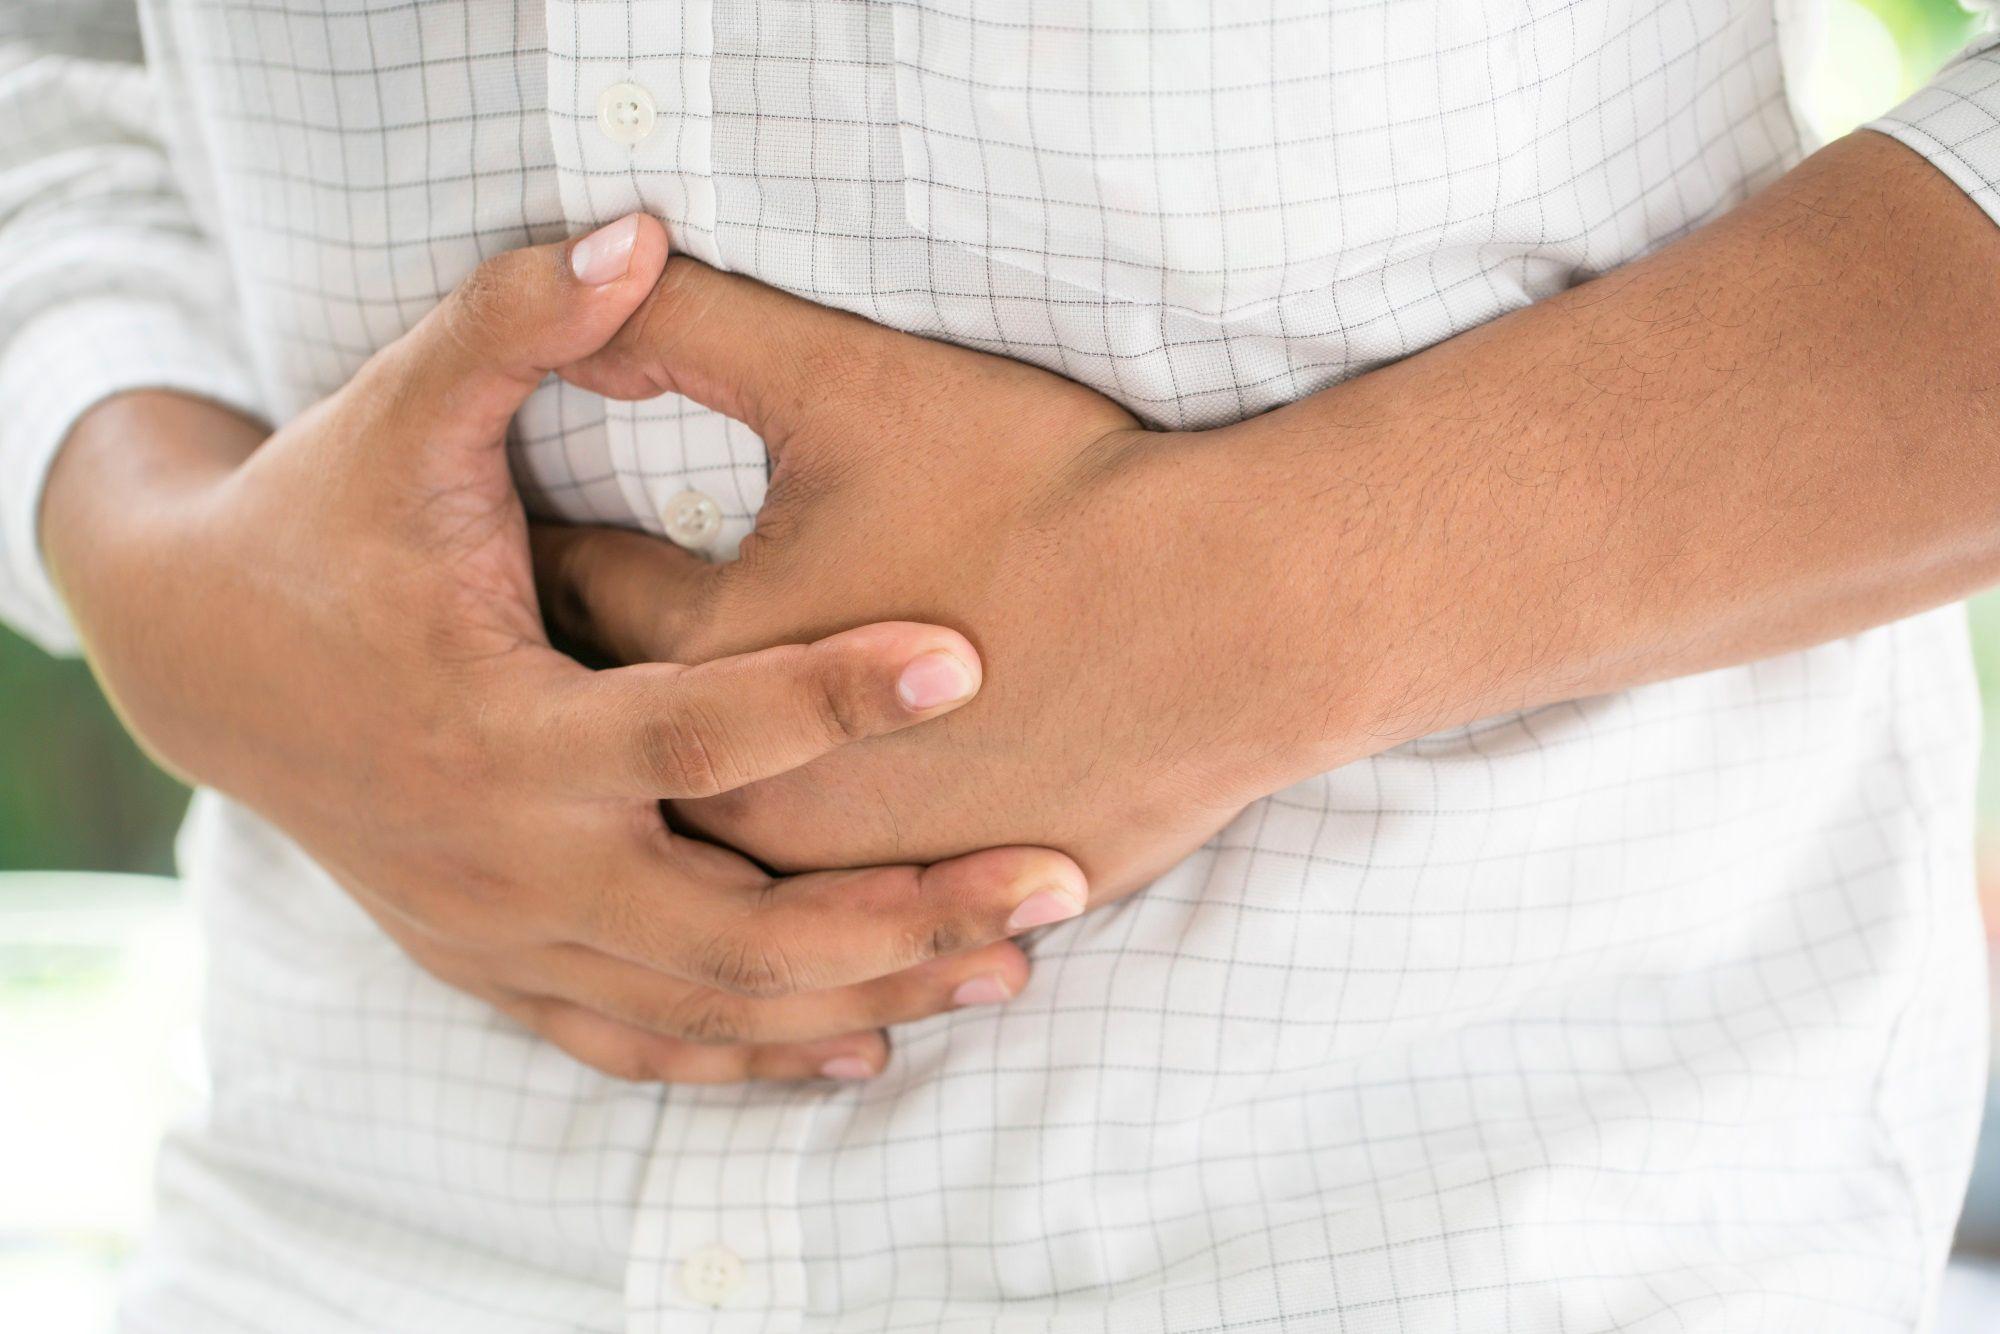 maladie intestinale grave